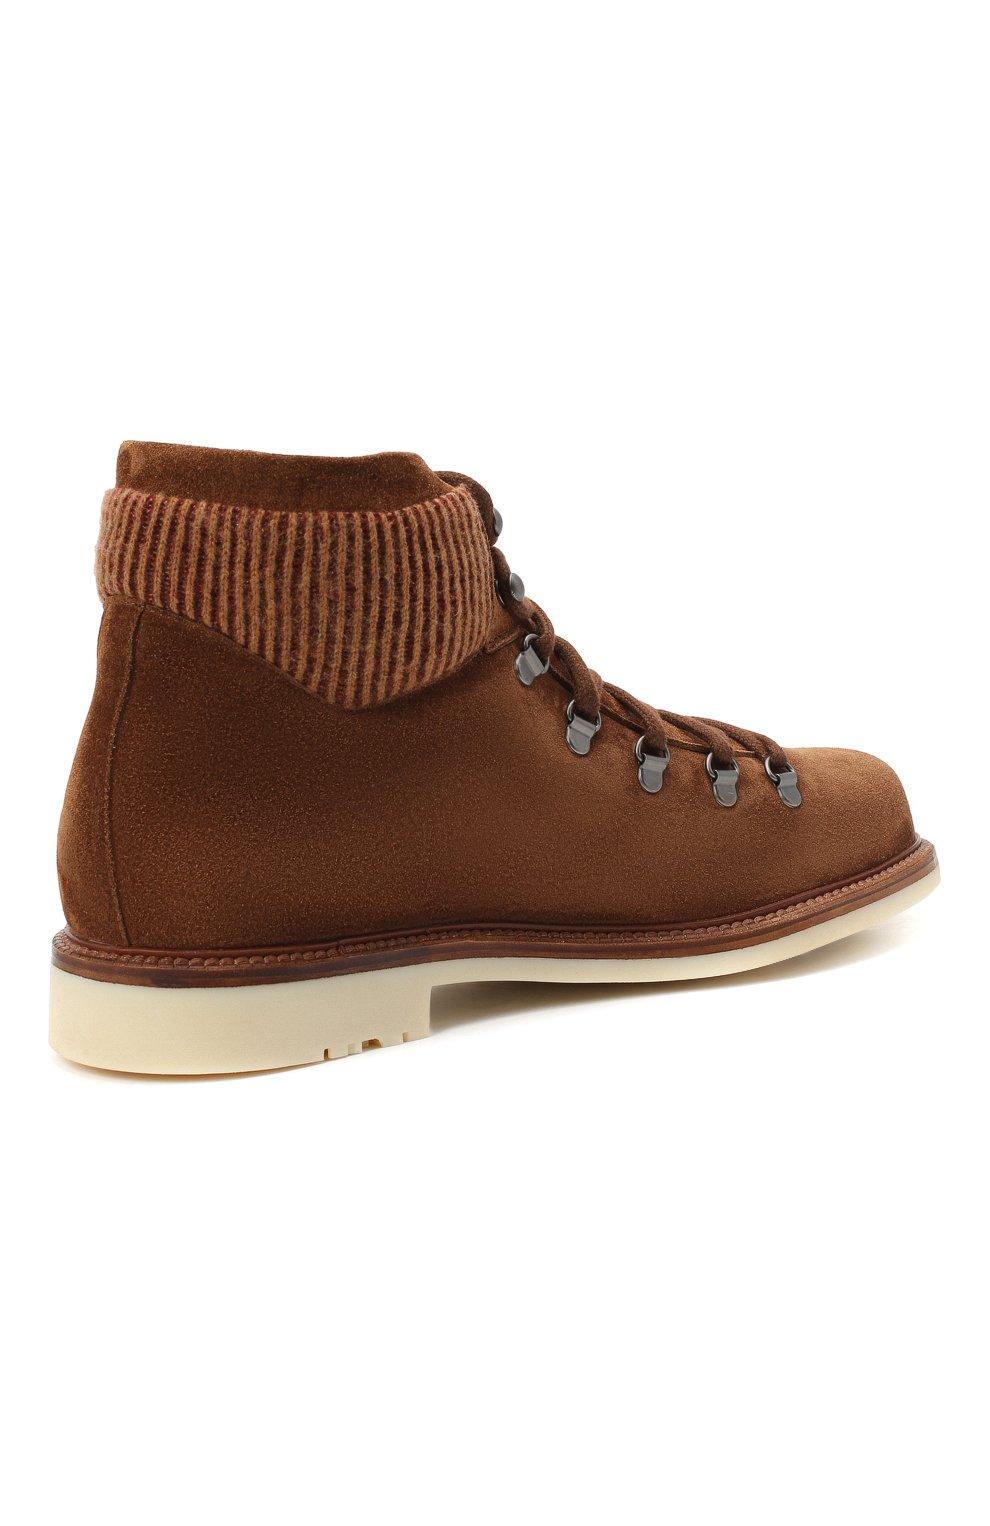 Мужские замшевые ботинки LORO PIANA светло-коричневого цвета, арт. FAL4424 | Фото 4